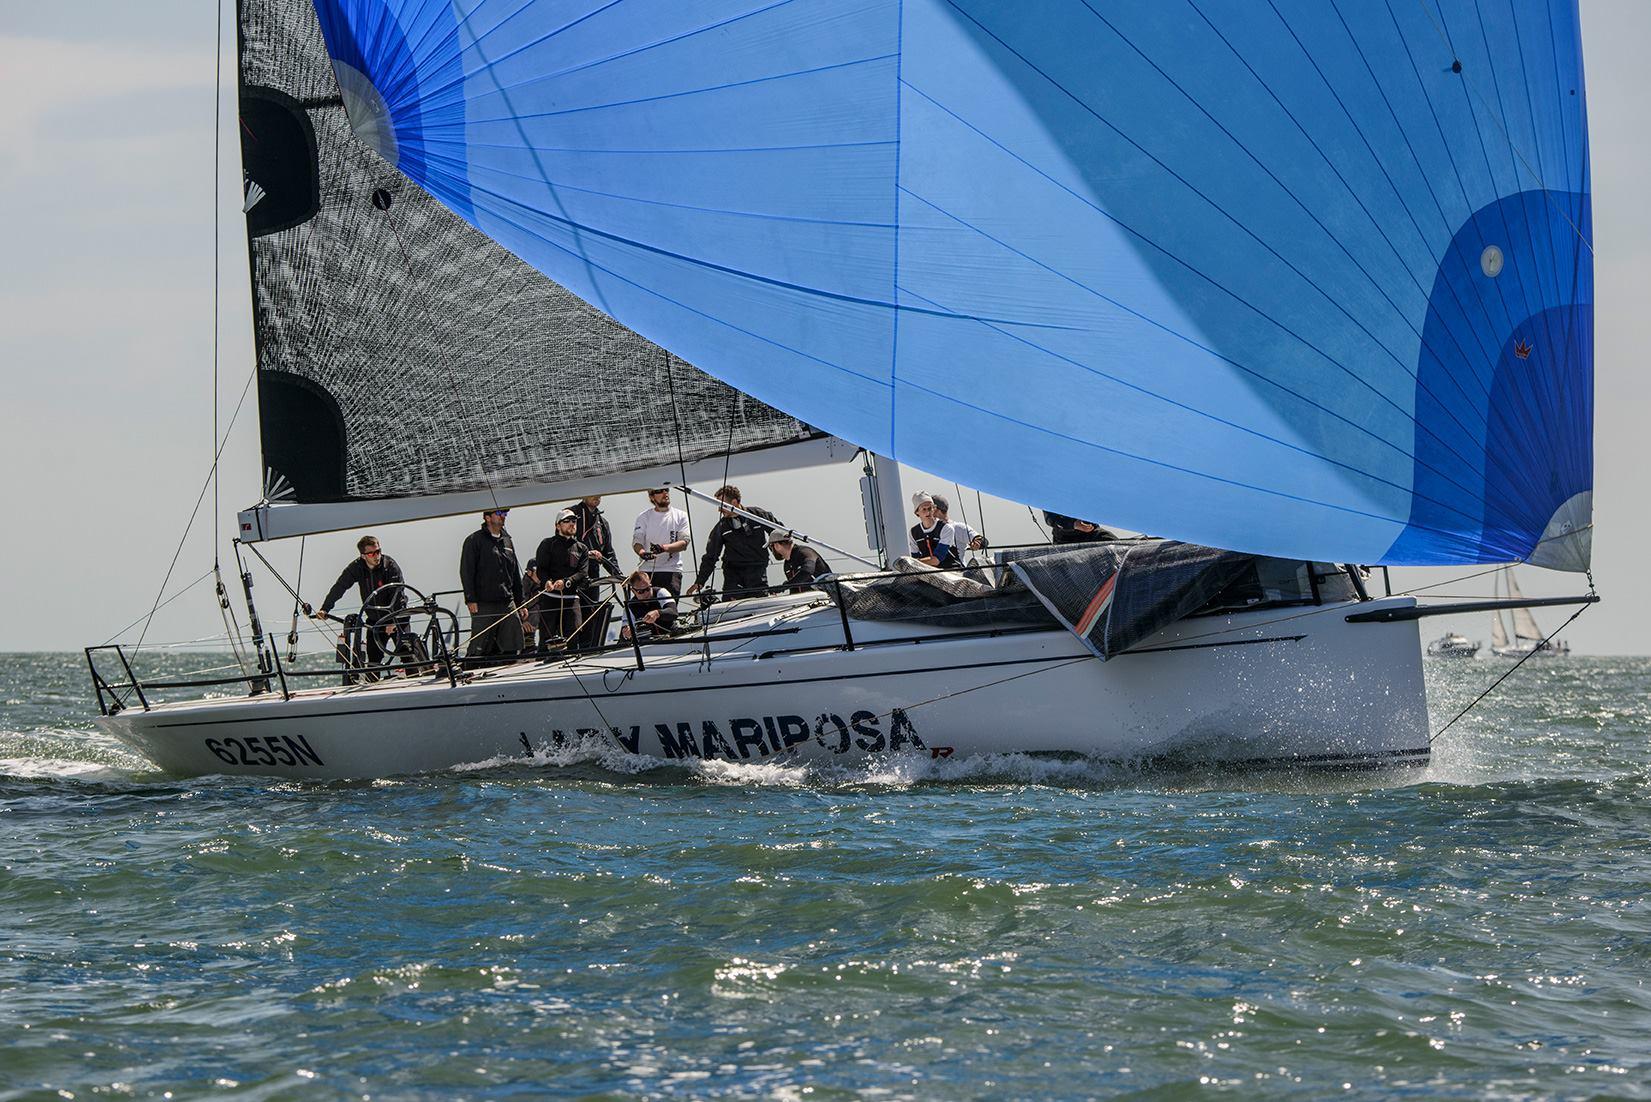 Lady_Mariposa_Racing_ RORC_North_Sea_regatta_2017_6.jpg